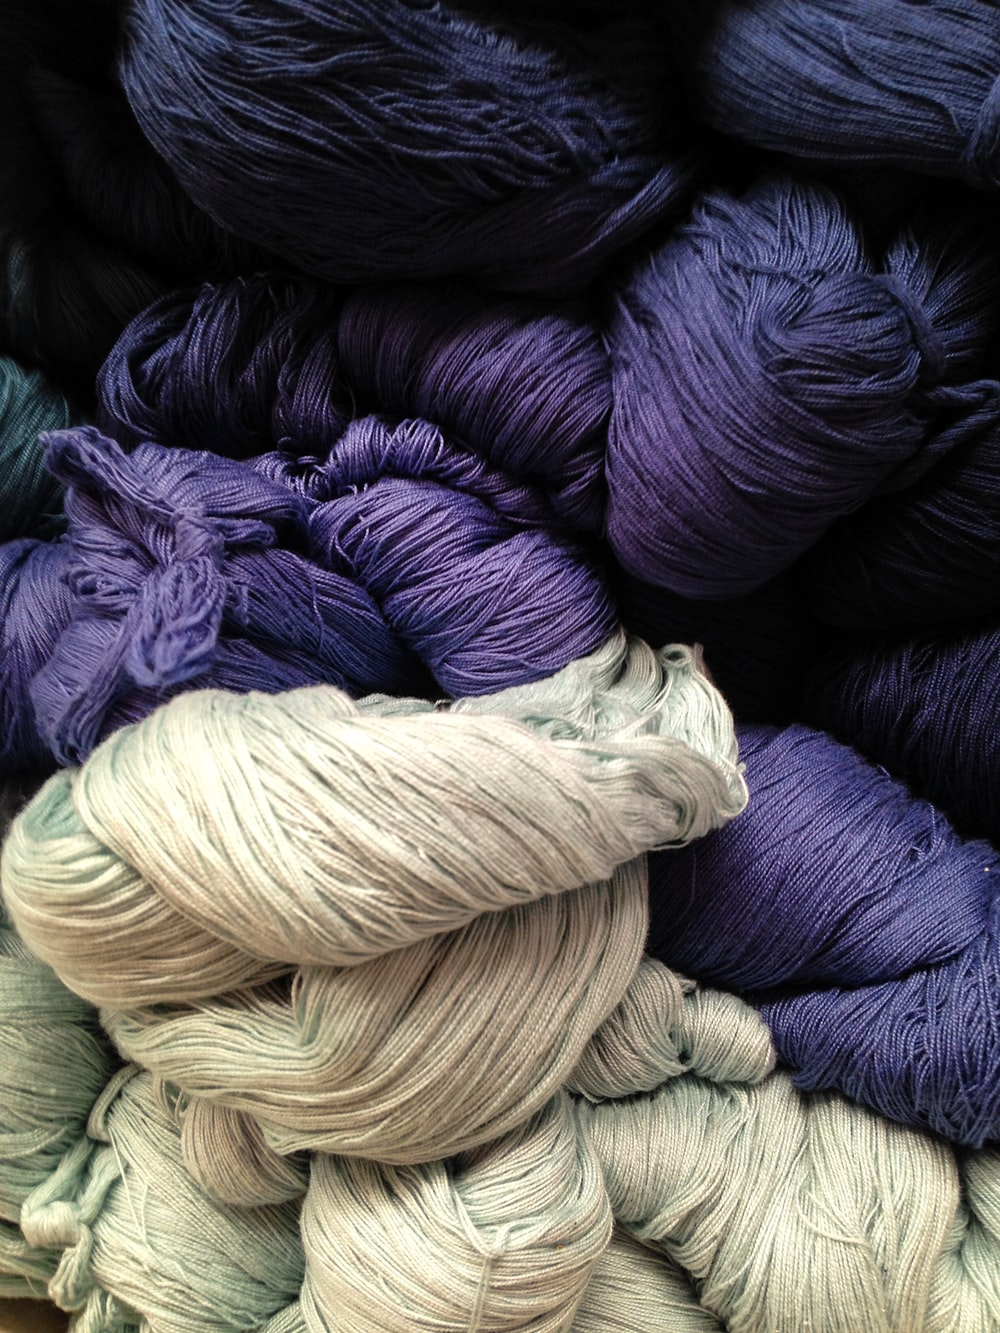 gray and purple yarns